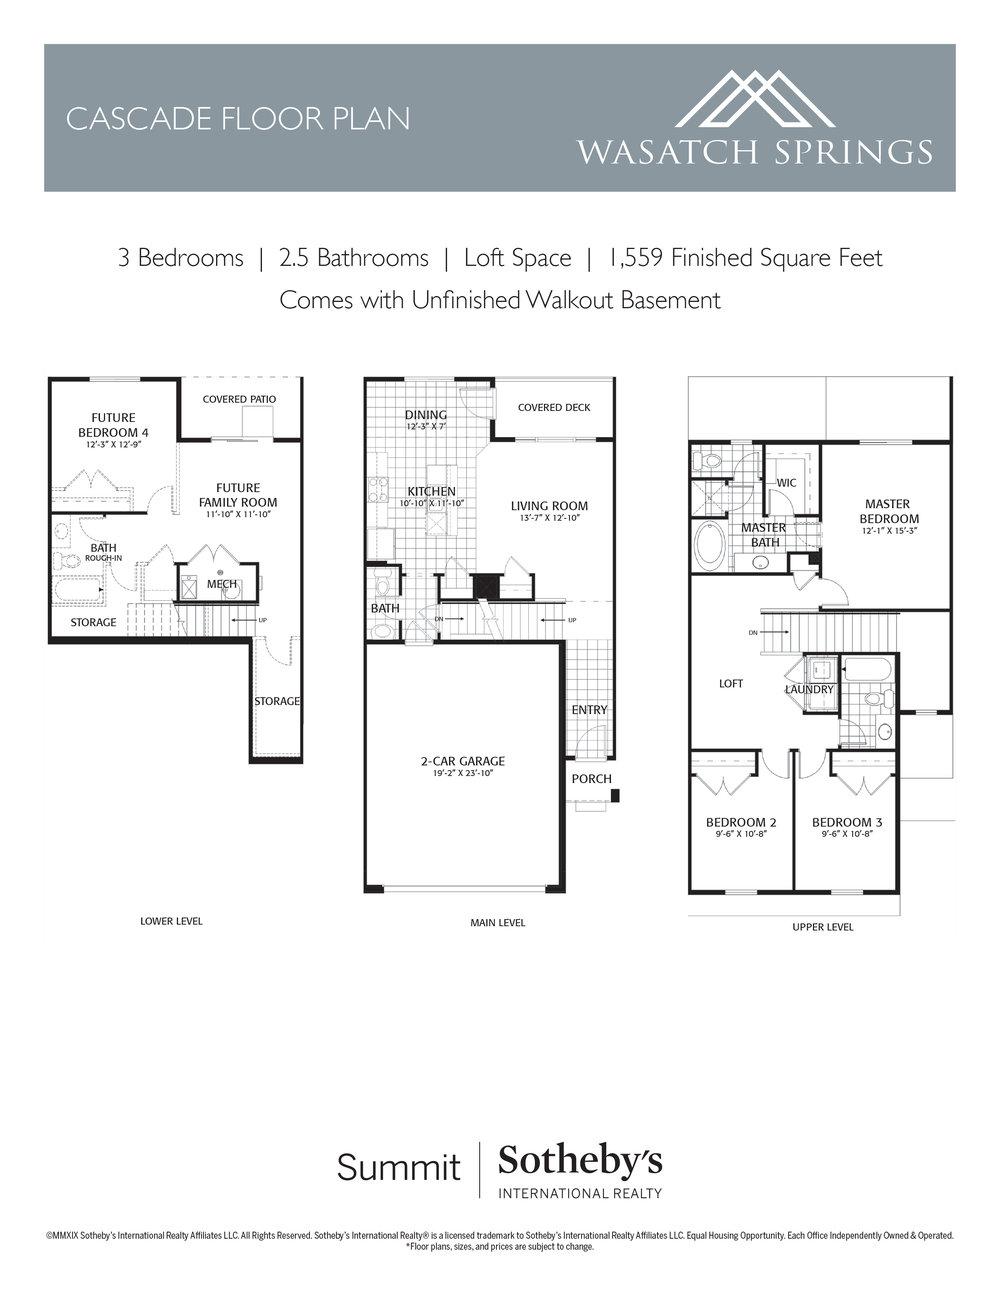 Cascade Floor Plan.jpg